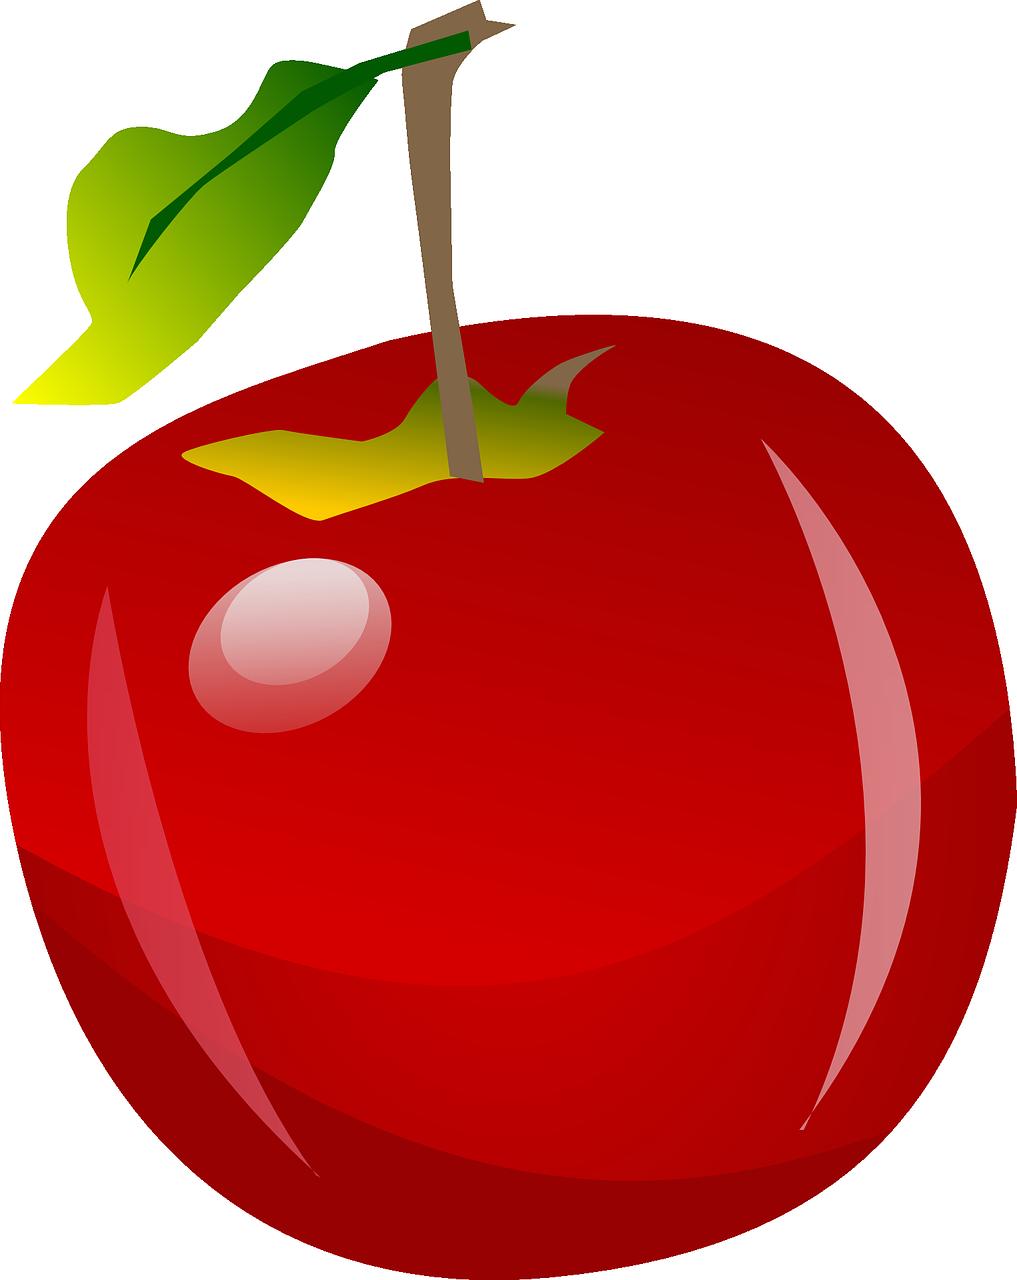 apple clip art clipart panda free clipart images rh clipartpanda com clipart apple tree free free apple clip art downloads